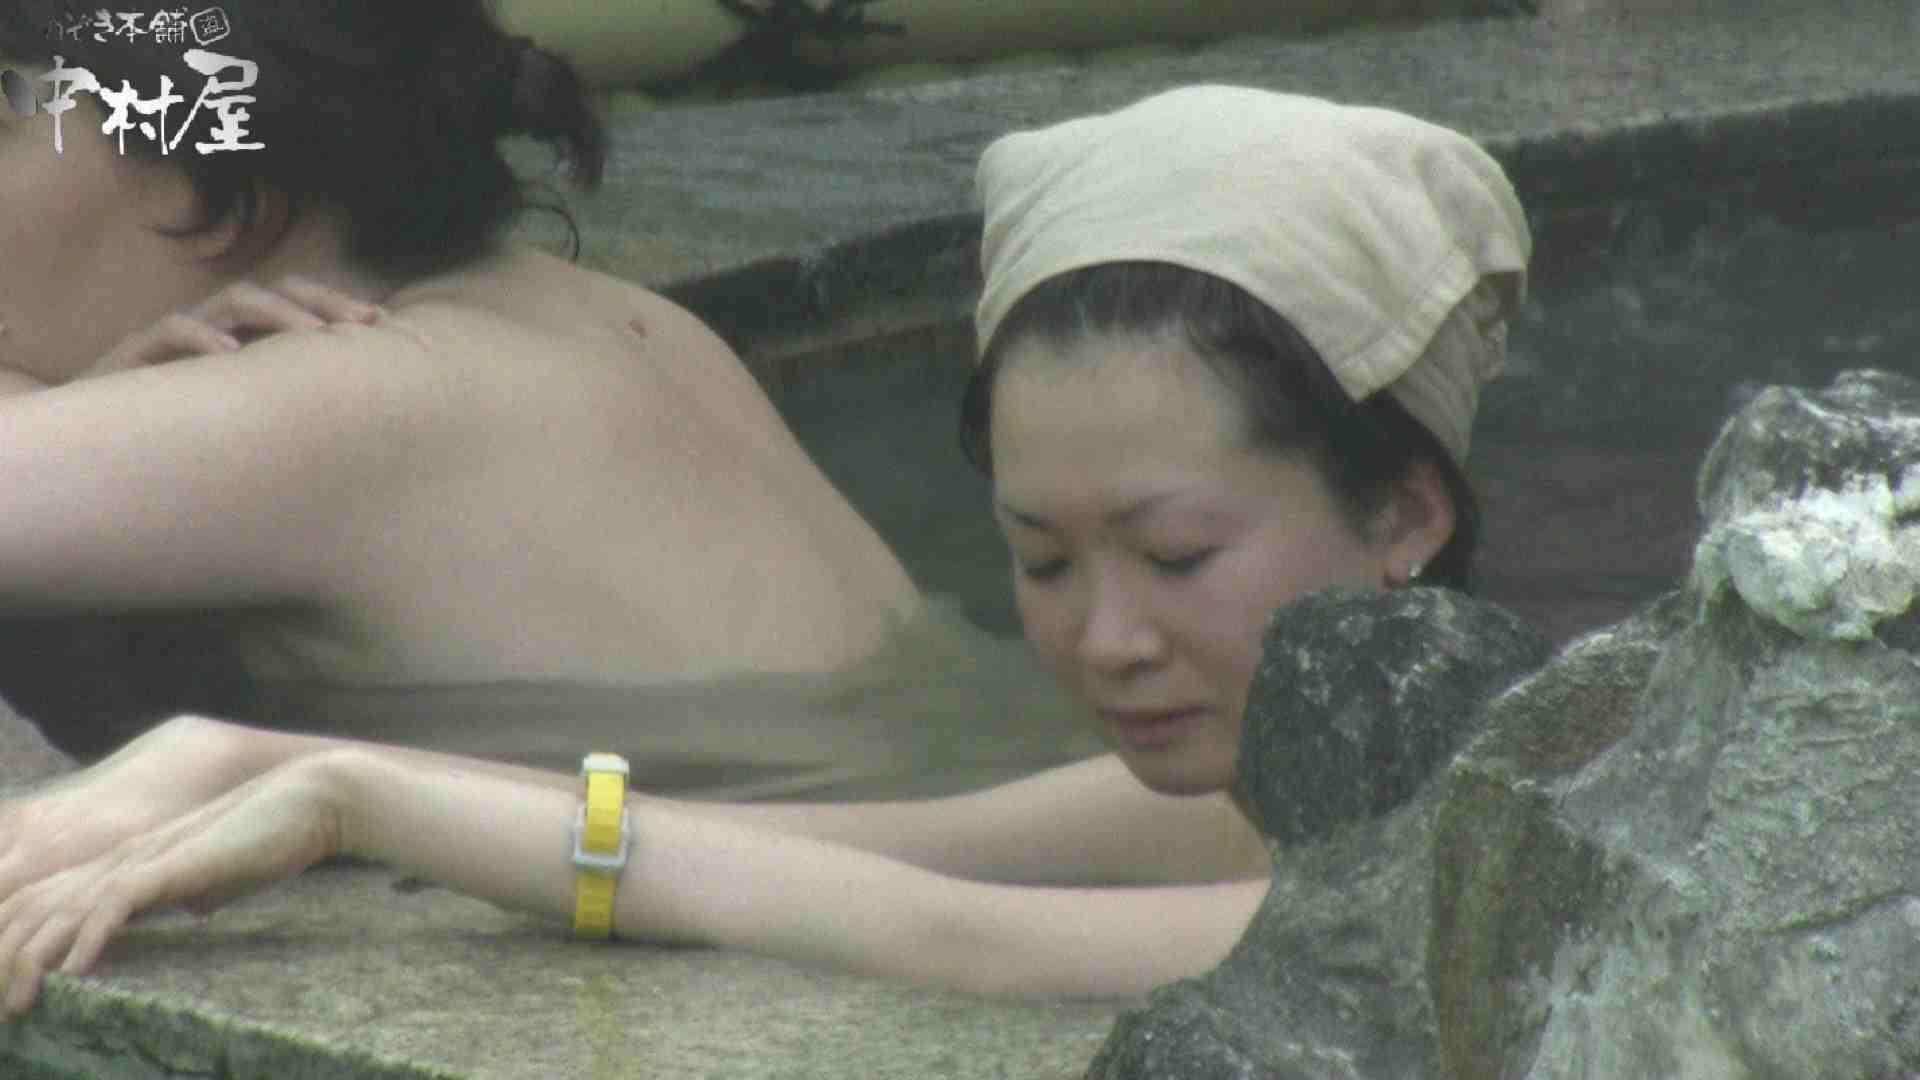 Aquaな露天風呂Vol.906 OLセックス 盗撮オマンコ無修正動画無料 92画像 53